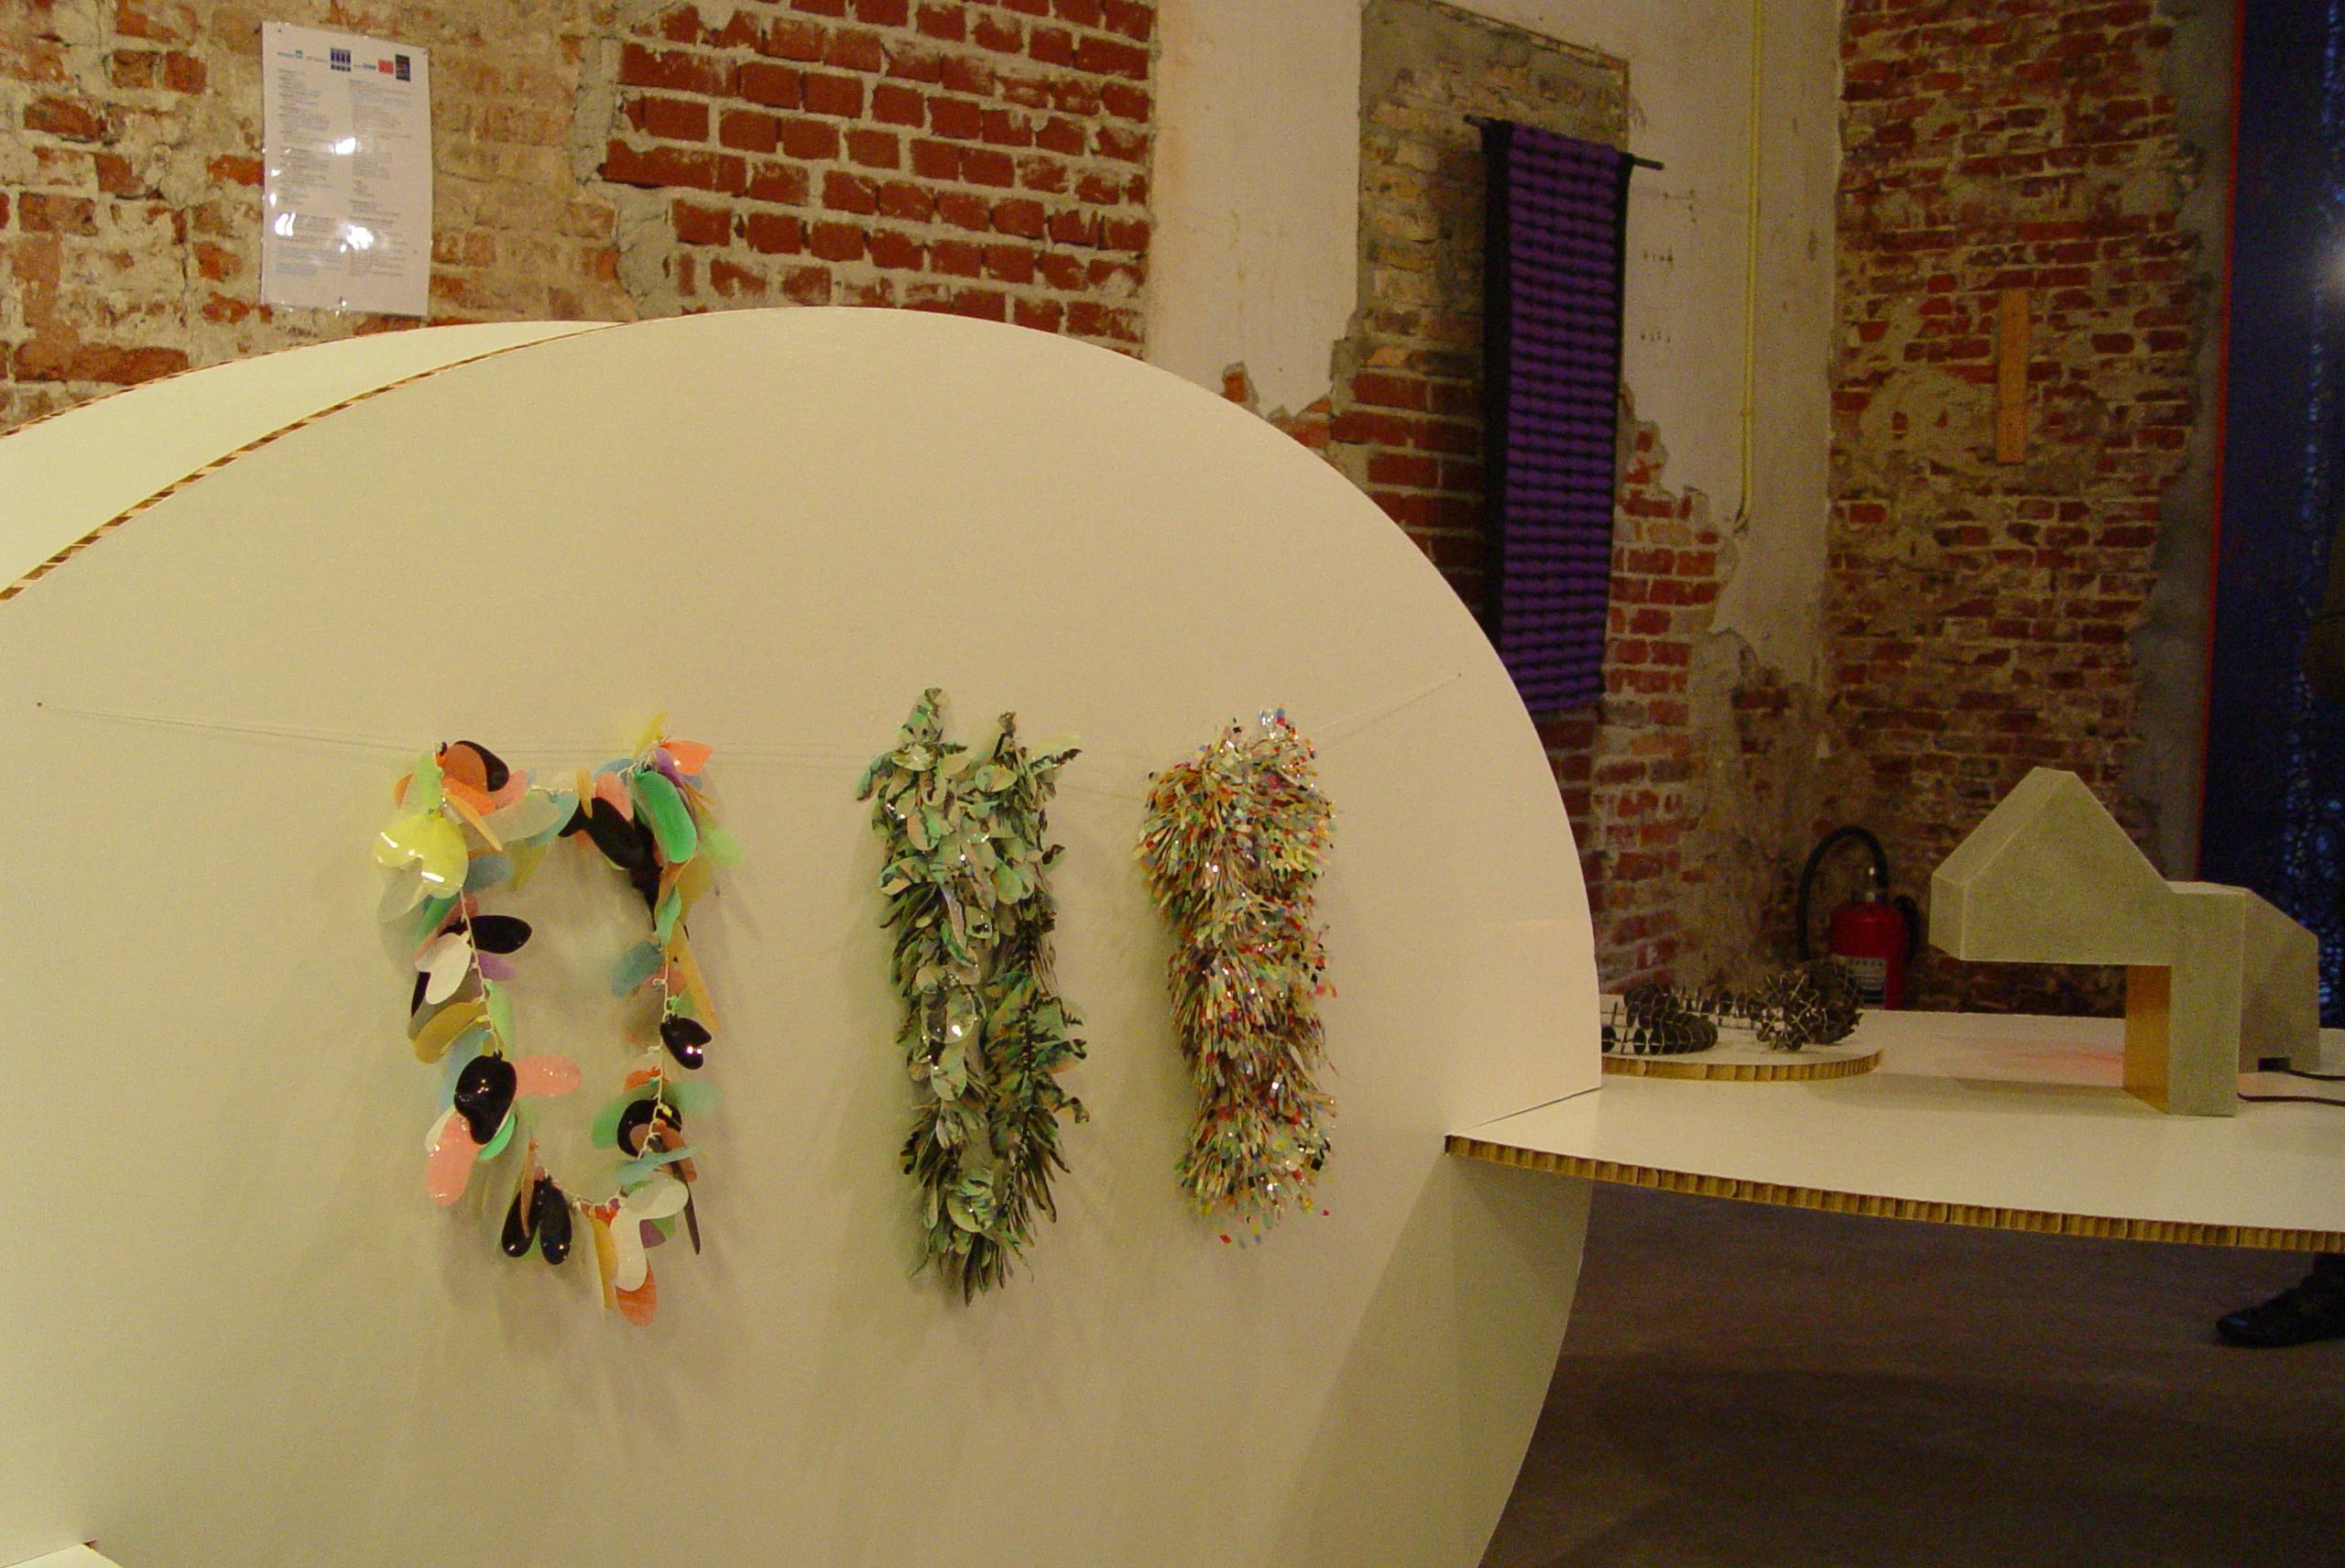 Sarah Enoch, halssieraden, Beyond Material, tentoonstelling, foto Birgit Laken